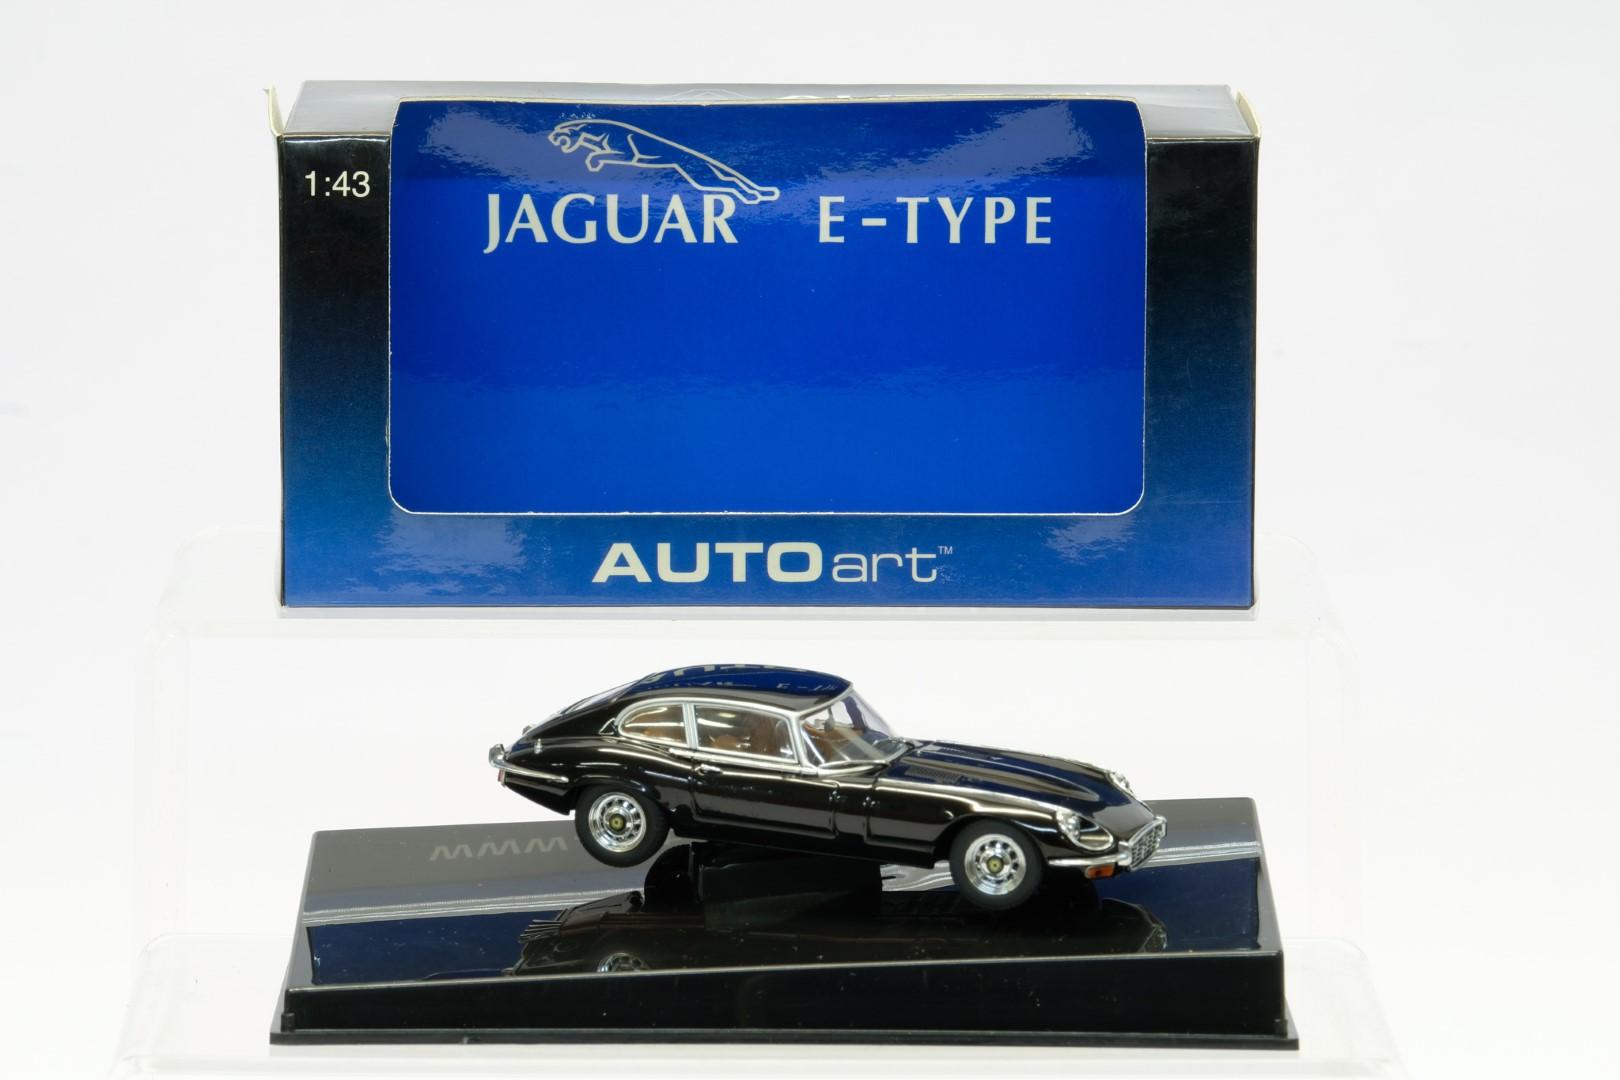 Autoart Jaguar - E-Type V12 Coupe Series III 1971 - Image 2 of 3